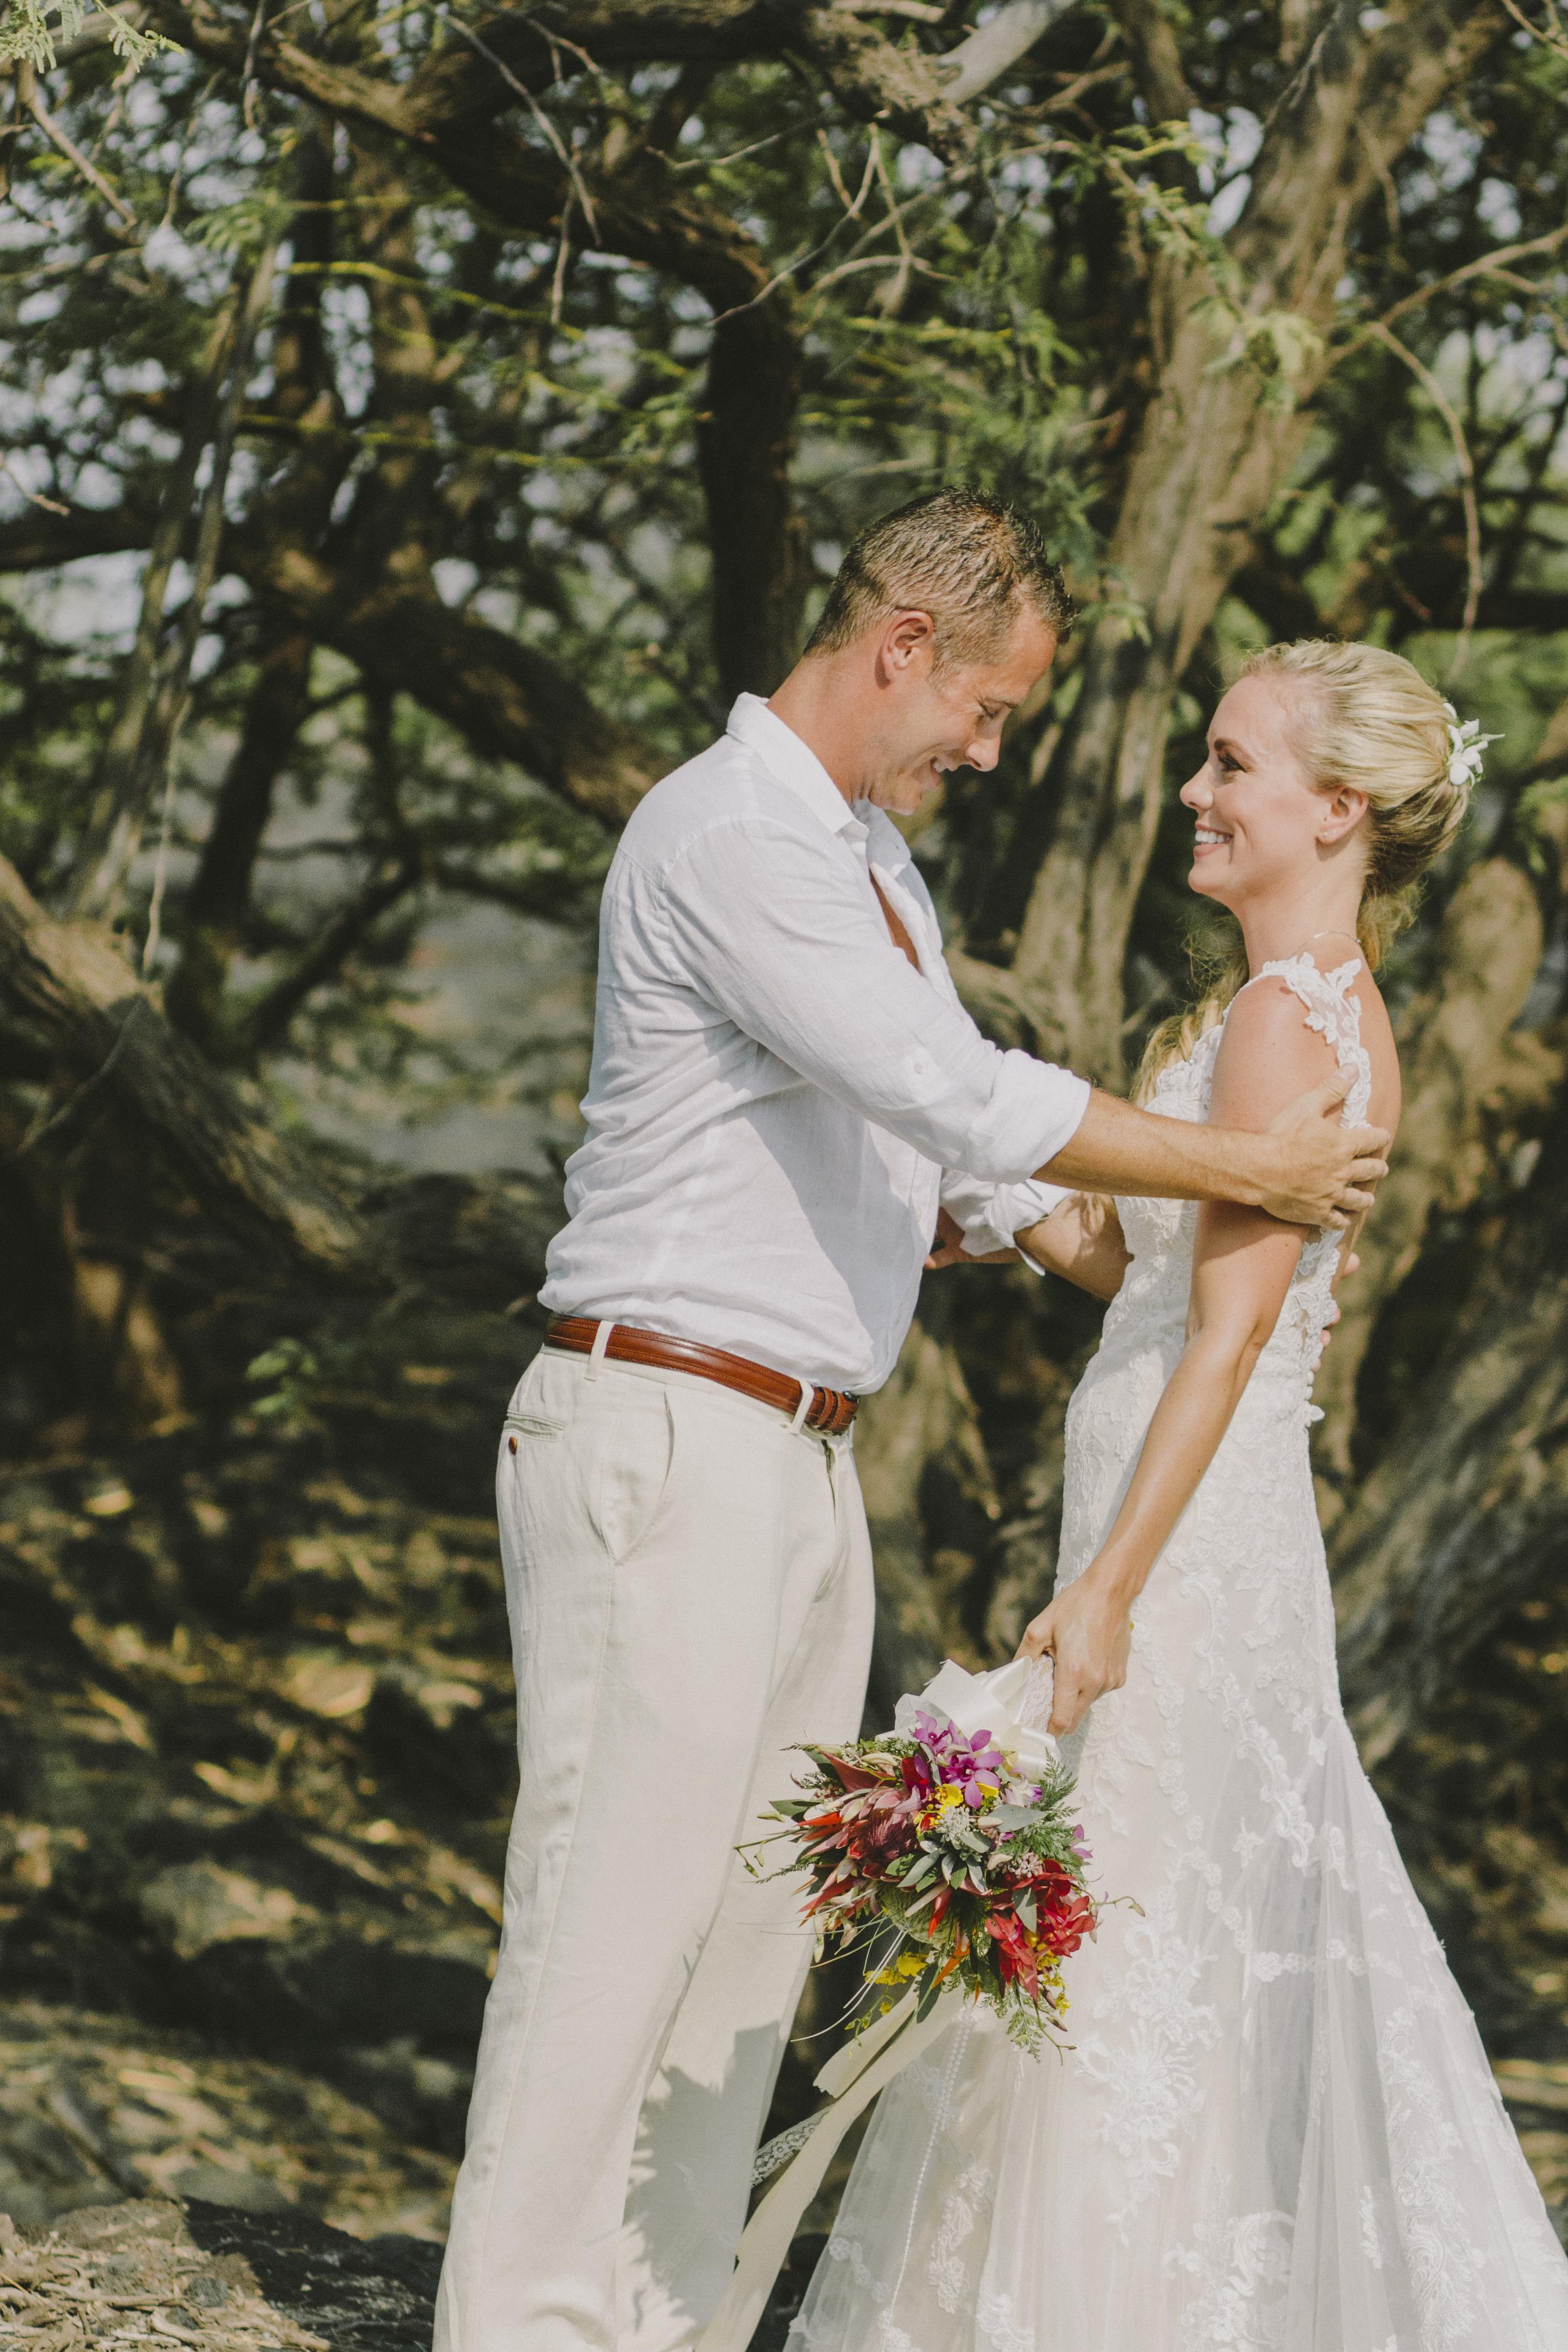 angie-diaz-photography-hawaii-wedding-photographer-kelli-jay-30.jpg